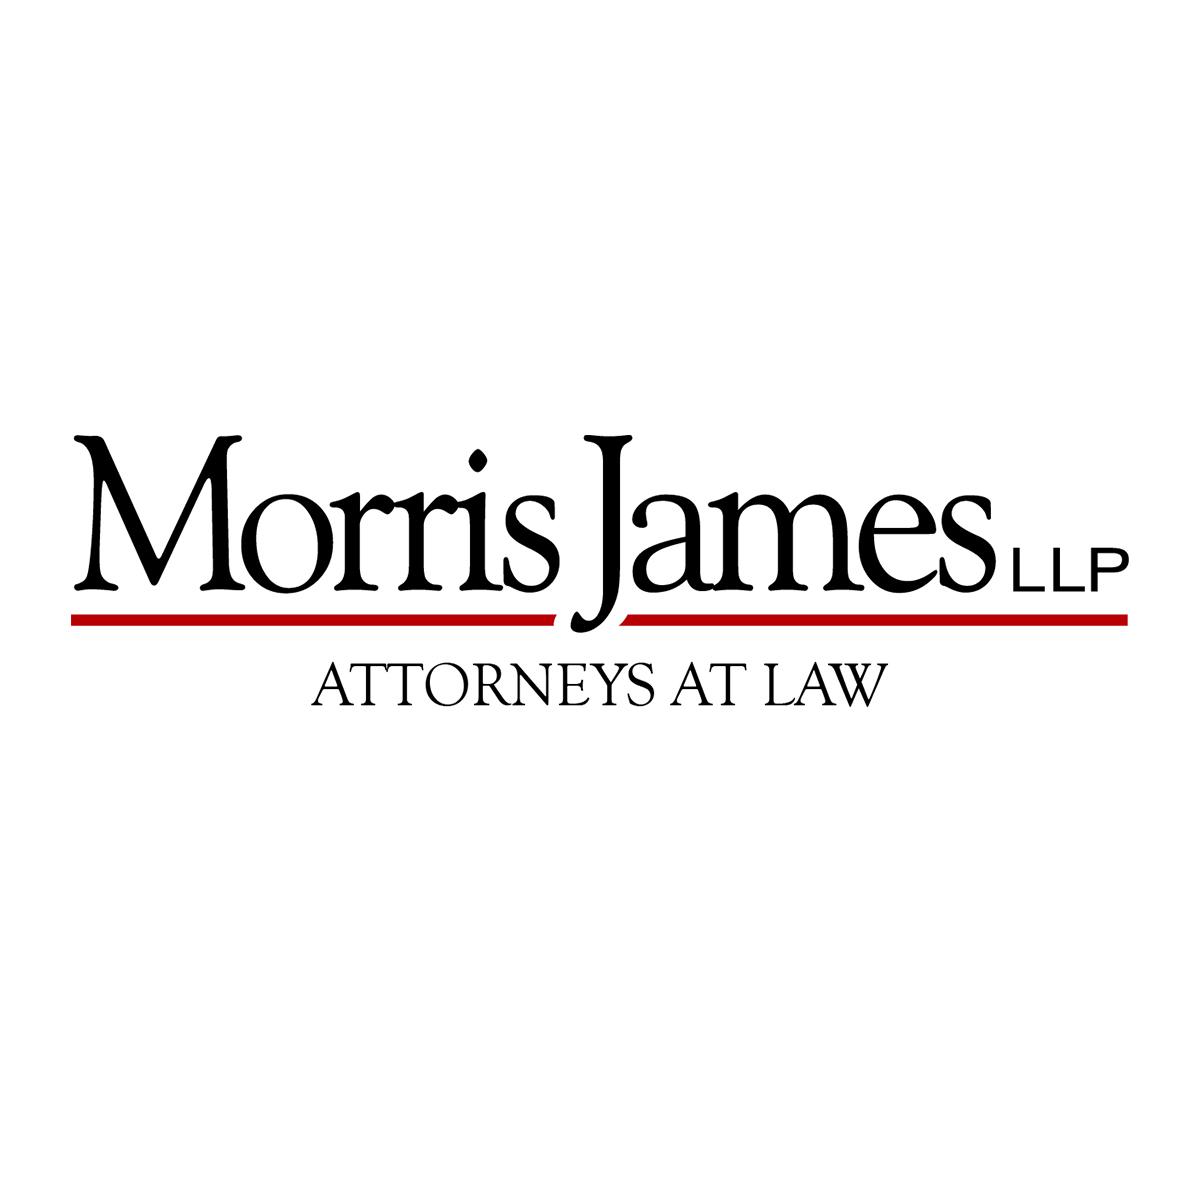 Eric J. Monzo: Morris James LLP